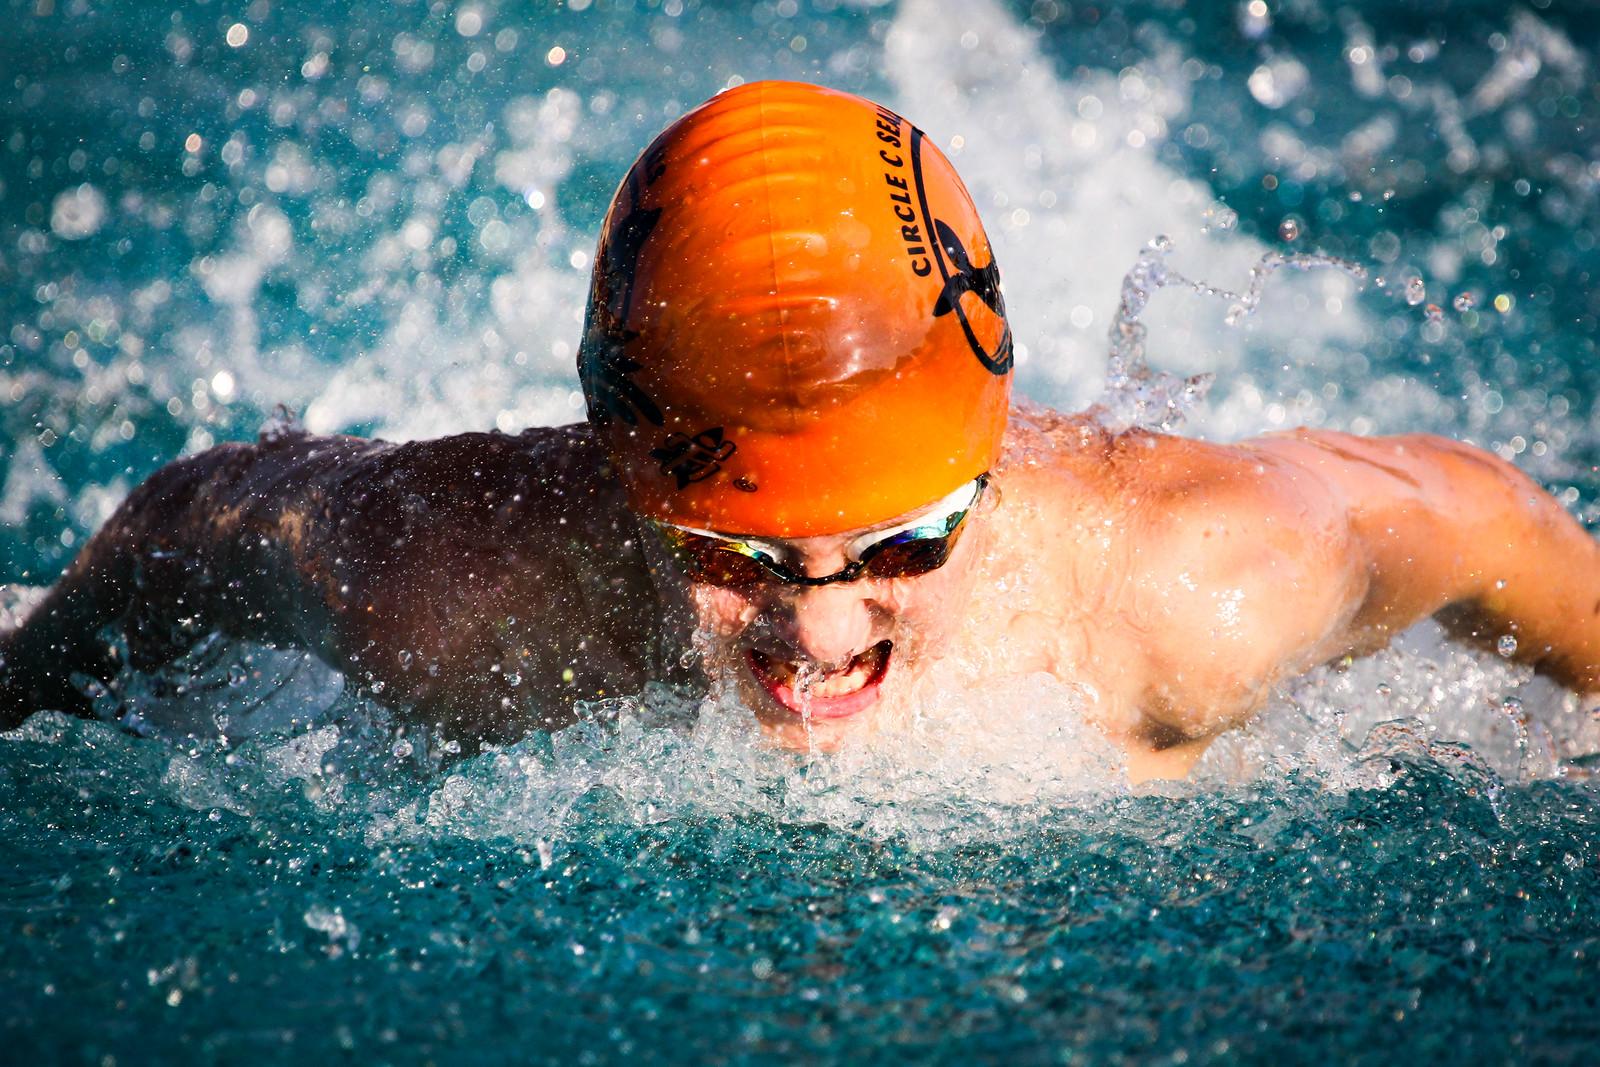 IMAGE: https://photos.smugmug.com/Sports/Swimming/Seals-Photos-2019/Cox-Rowan/i-F9hHTFH/1/0e390088/X3/A73X1077-X3.jpg